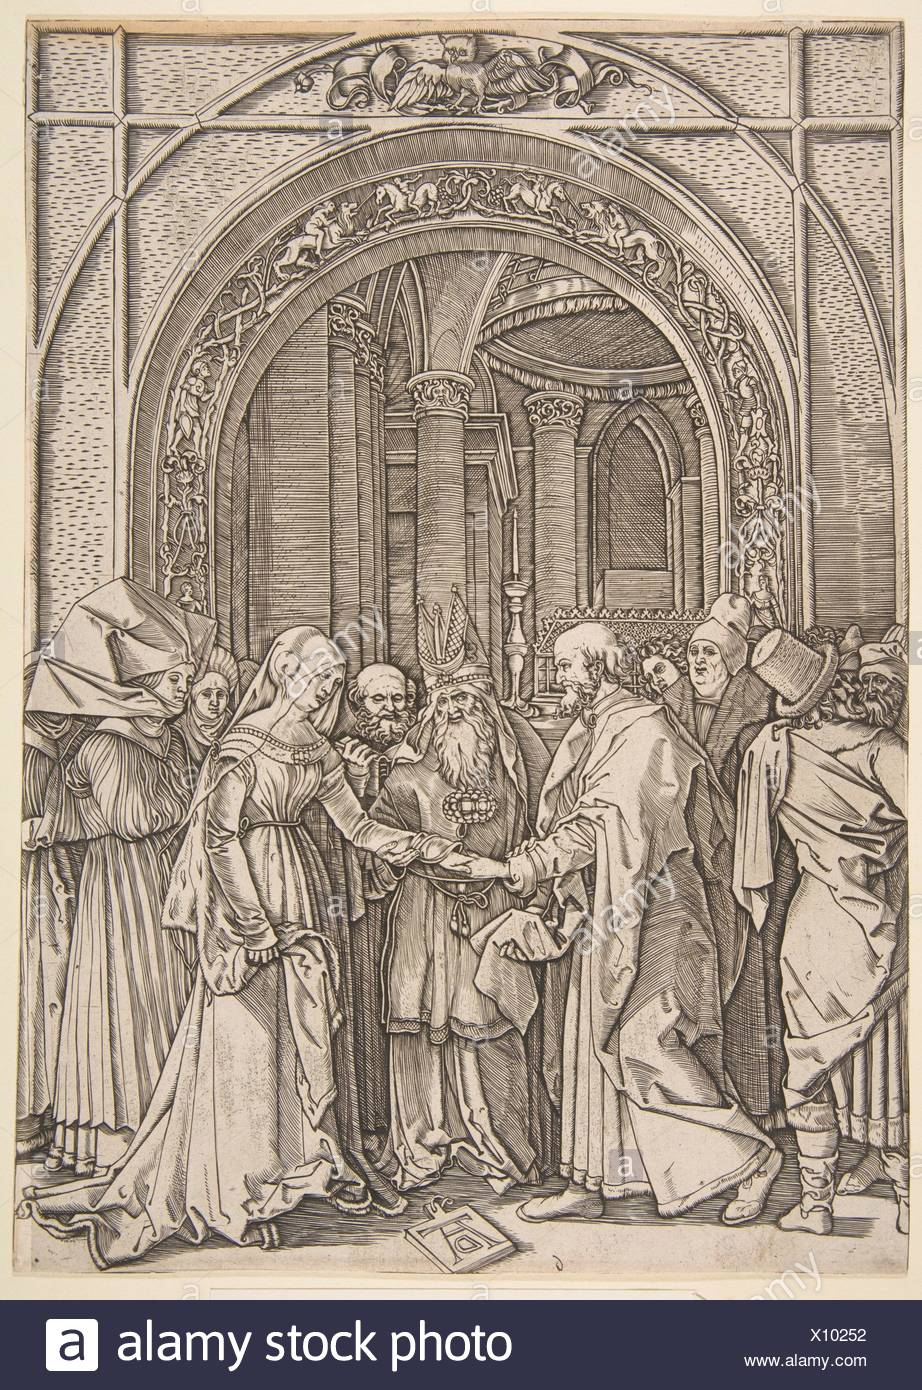 The Betrothal of the Virgin, from The Life of the Virgin (copy). Artist: After Albrecht Dürer (German, Nuremberg 1471-1528 Nuremberg); Artist: - Stock Image